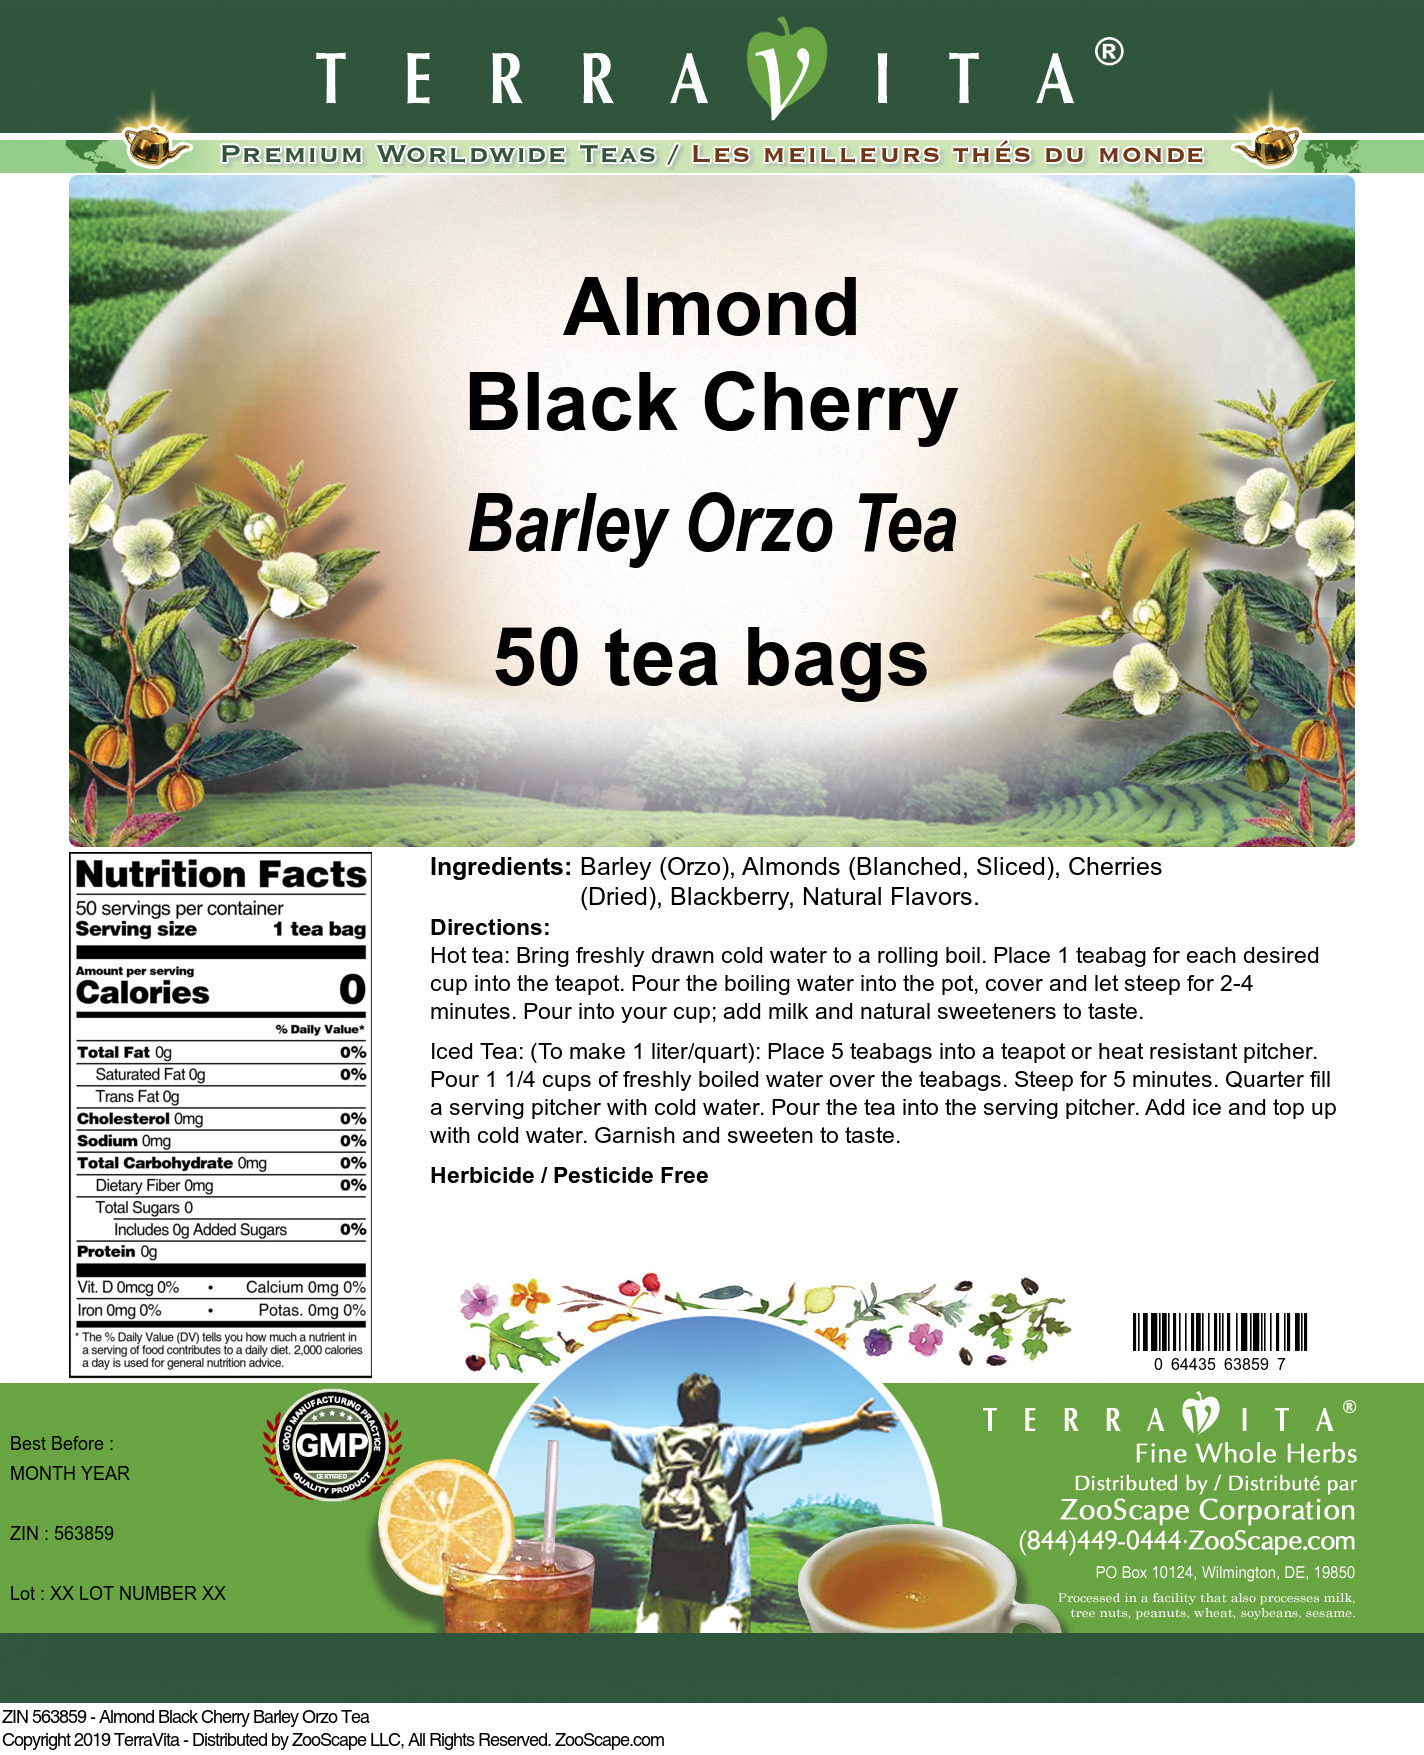 Almond Black Cherry Barley Orzo Tea